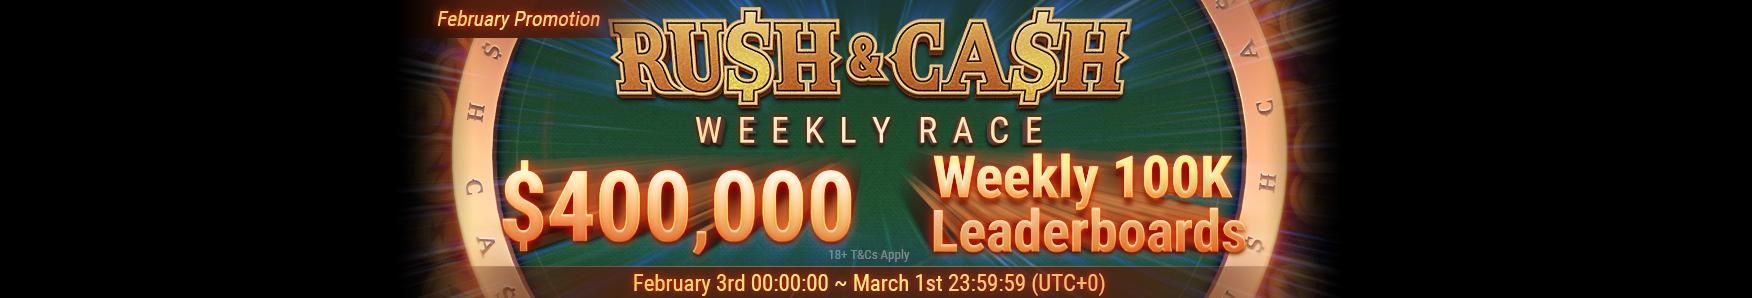 Rush & cash Weekly race